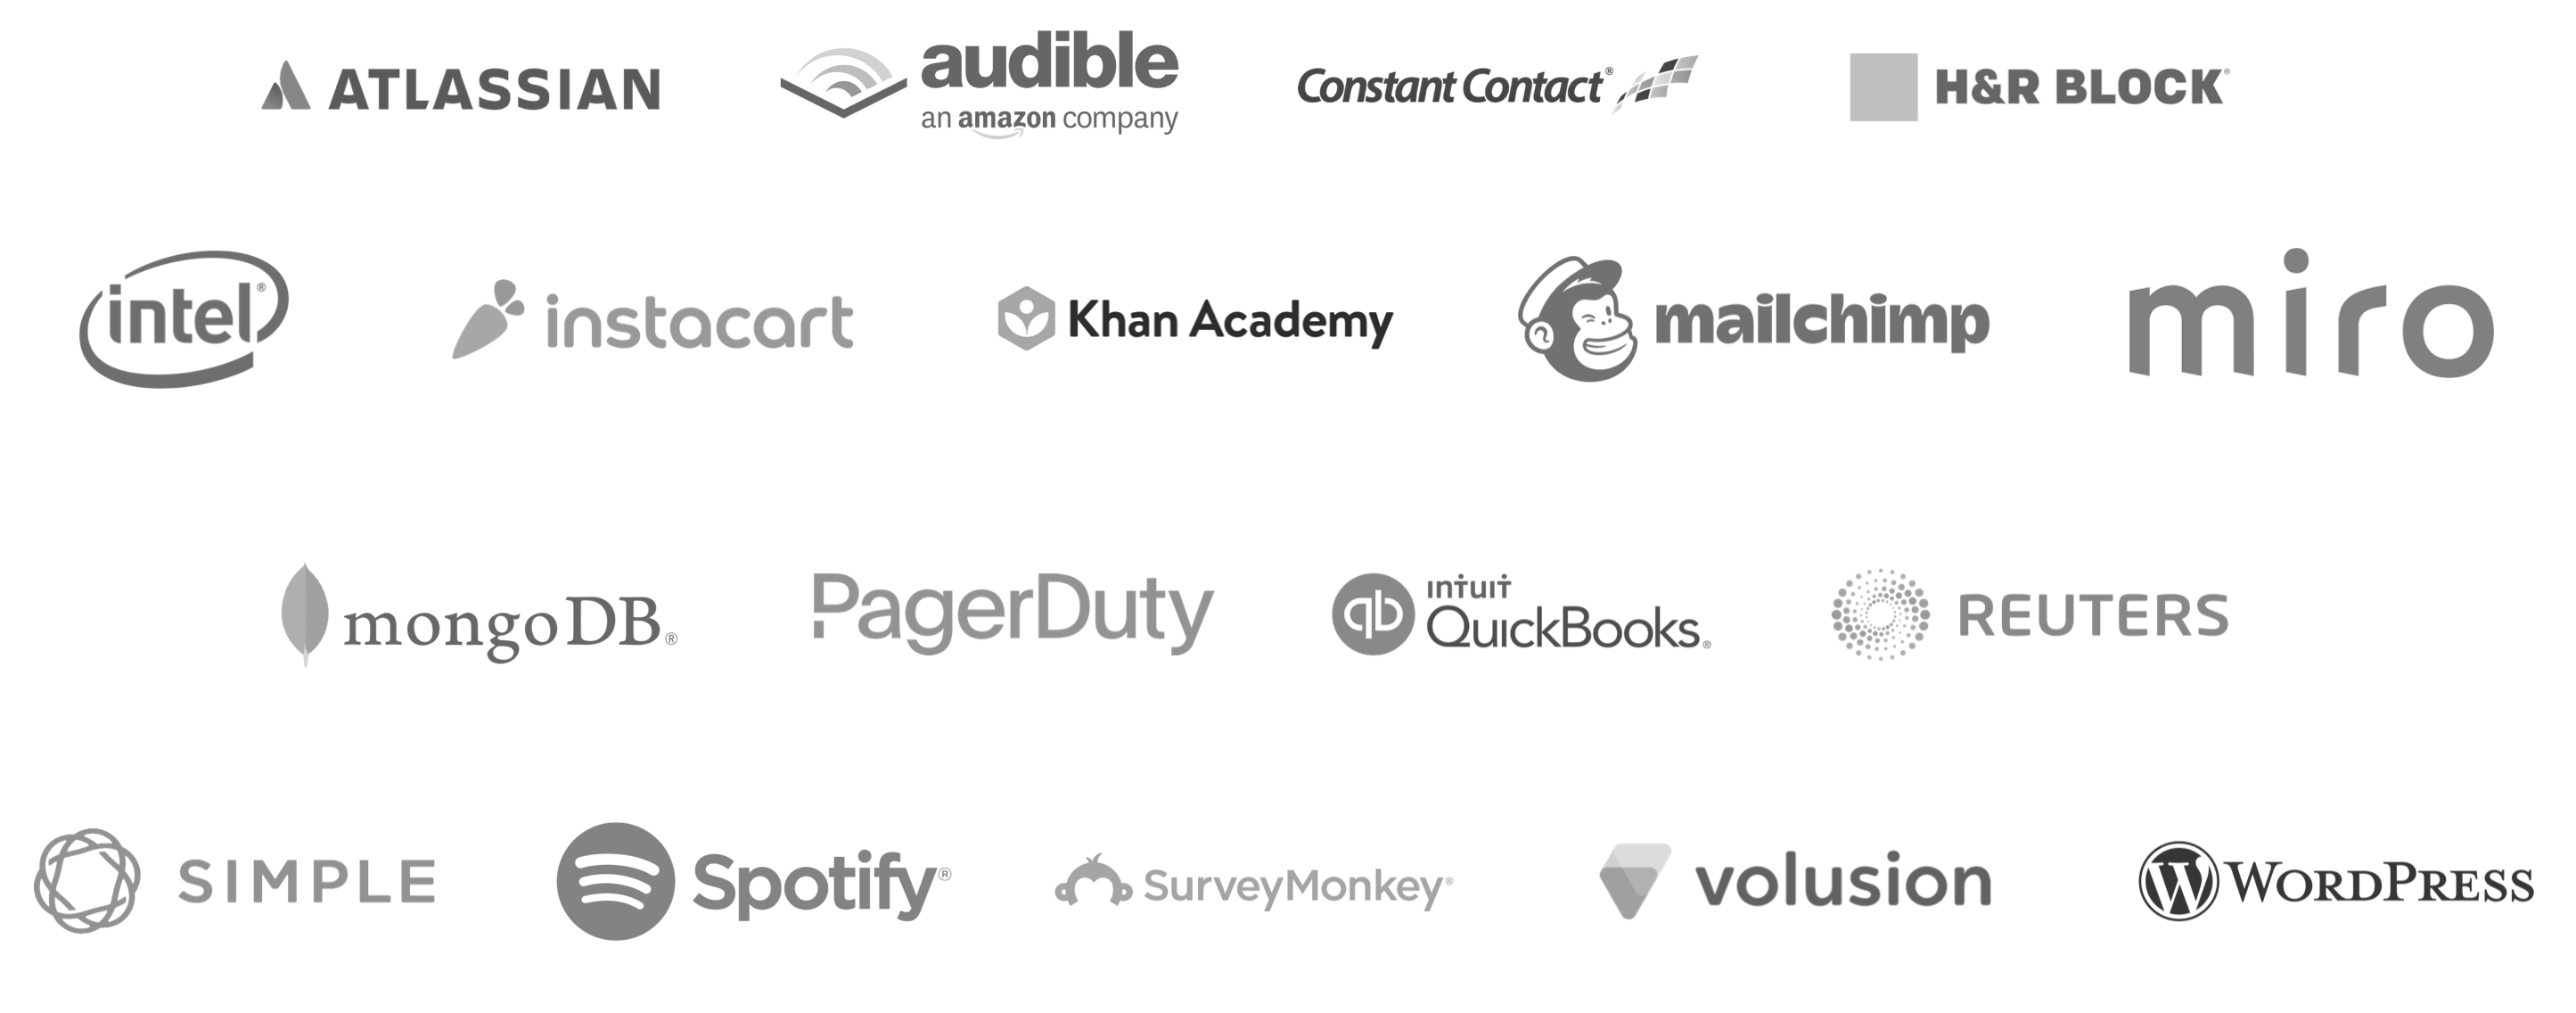 WordPress | MailChimp | Simple | SurveyMonkey | CrazyEgg